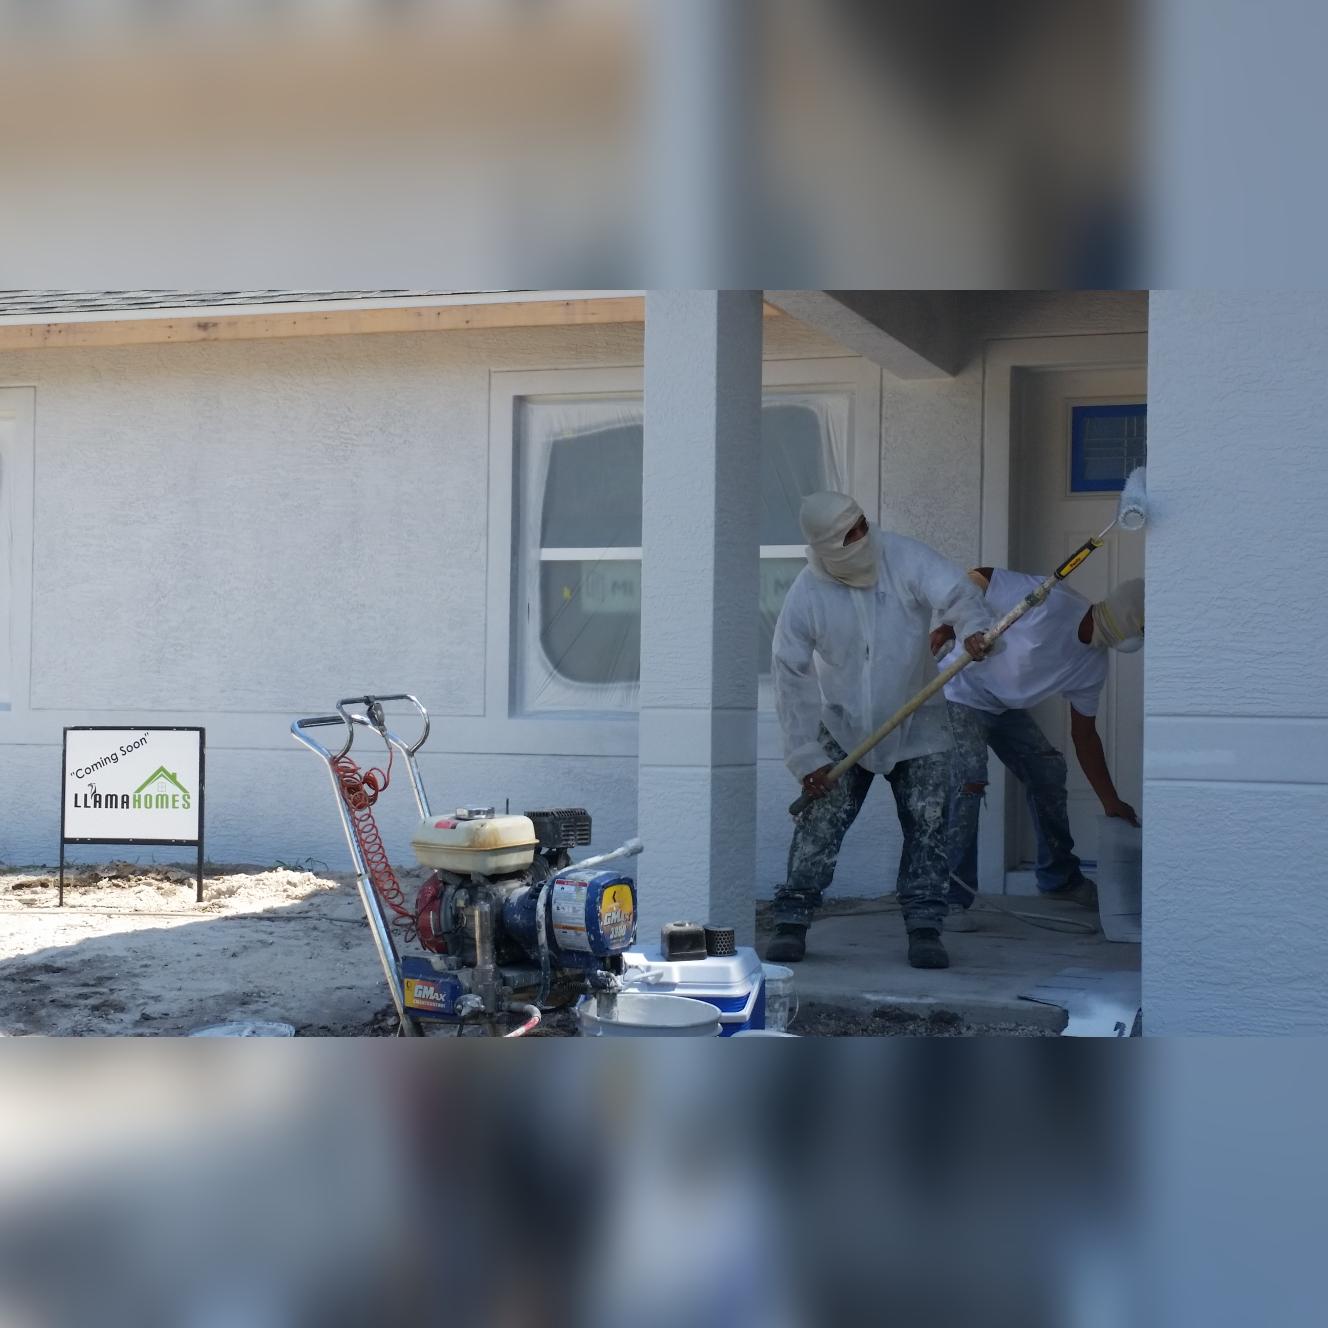 Best Painters In Brevard County. Best Painters in Melbourne. Best Painters in orange county. Best Painters in palmbay Florida. Best Painters. . . . . . #luxury #home #homepainting #Mansion #rich #painting #painters #painterslife #melbournefl #melbourneflorida #brevard #brevardcounty #homes #fancy #homeowners #homeoffice #paintmyhouse #painthouse #colors #entrepreneur #garyvee #grantcardone #amazing #superrich #vieraflorida